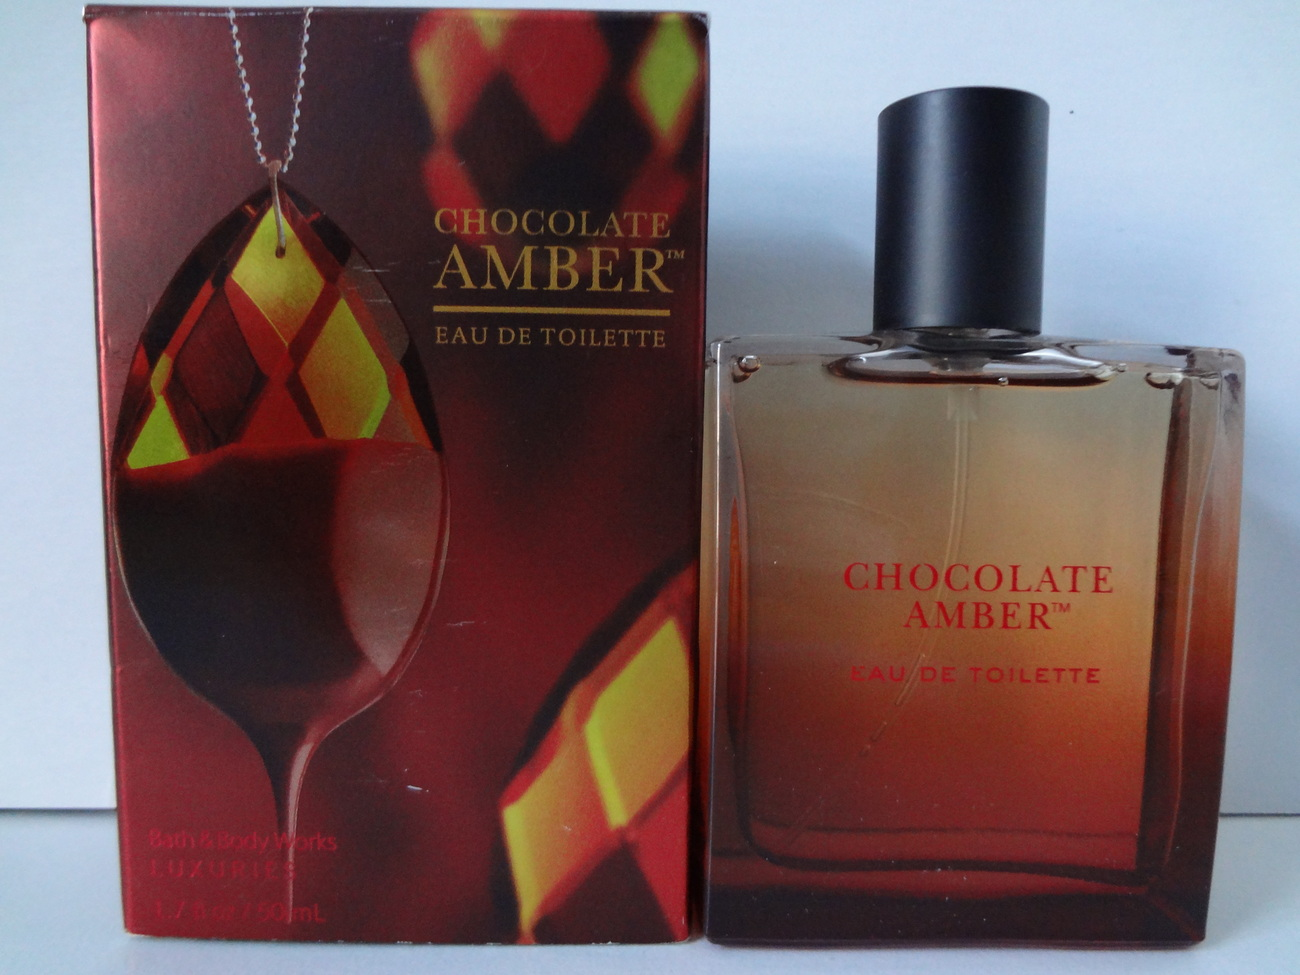 Bath & Body Works Luxuries Chocolate Amber Eau de Toilette 1.7 oz / 50 ml